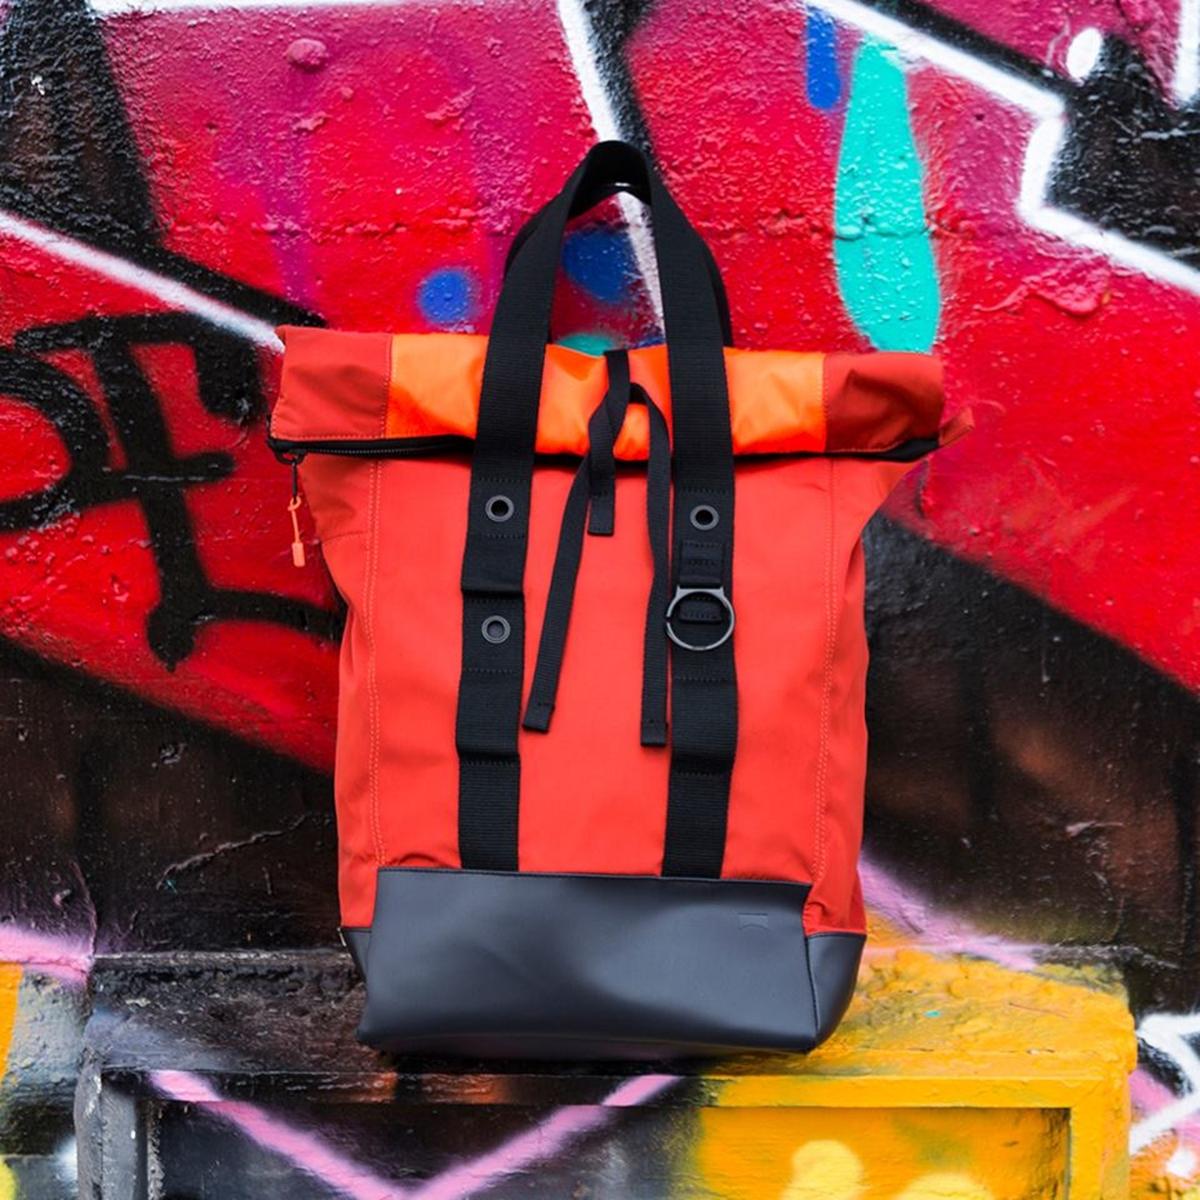 Adapack Bag De Camper Lab La Mochila Del Verano